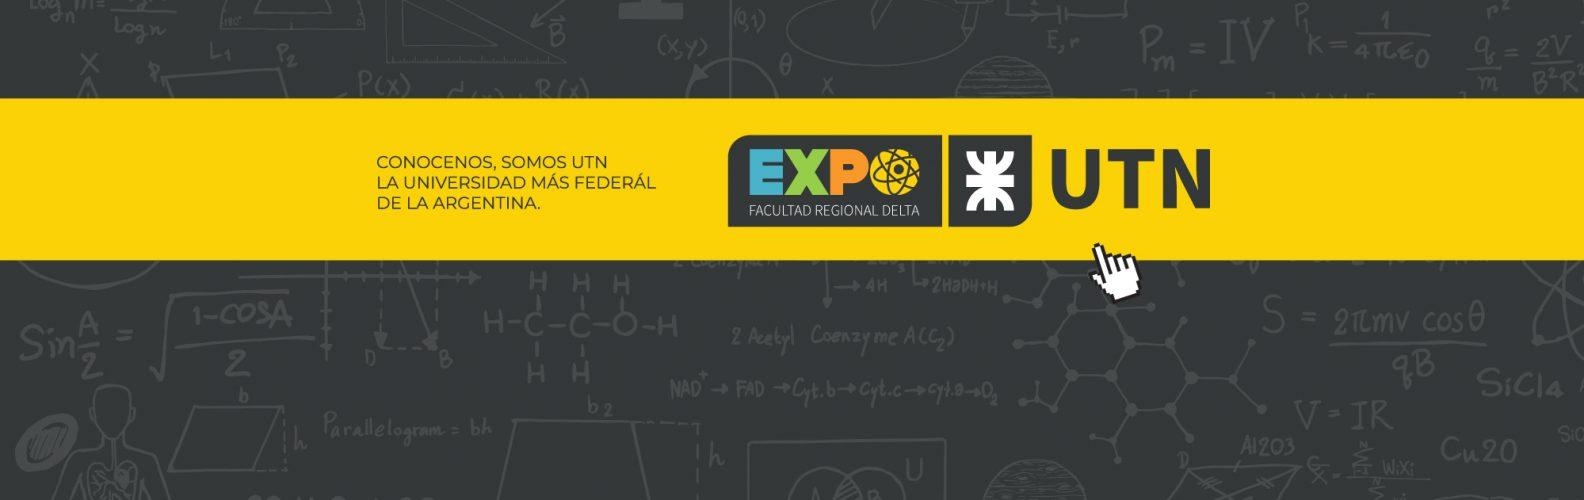 Expo-UTN